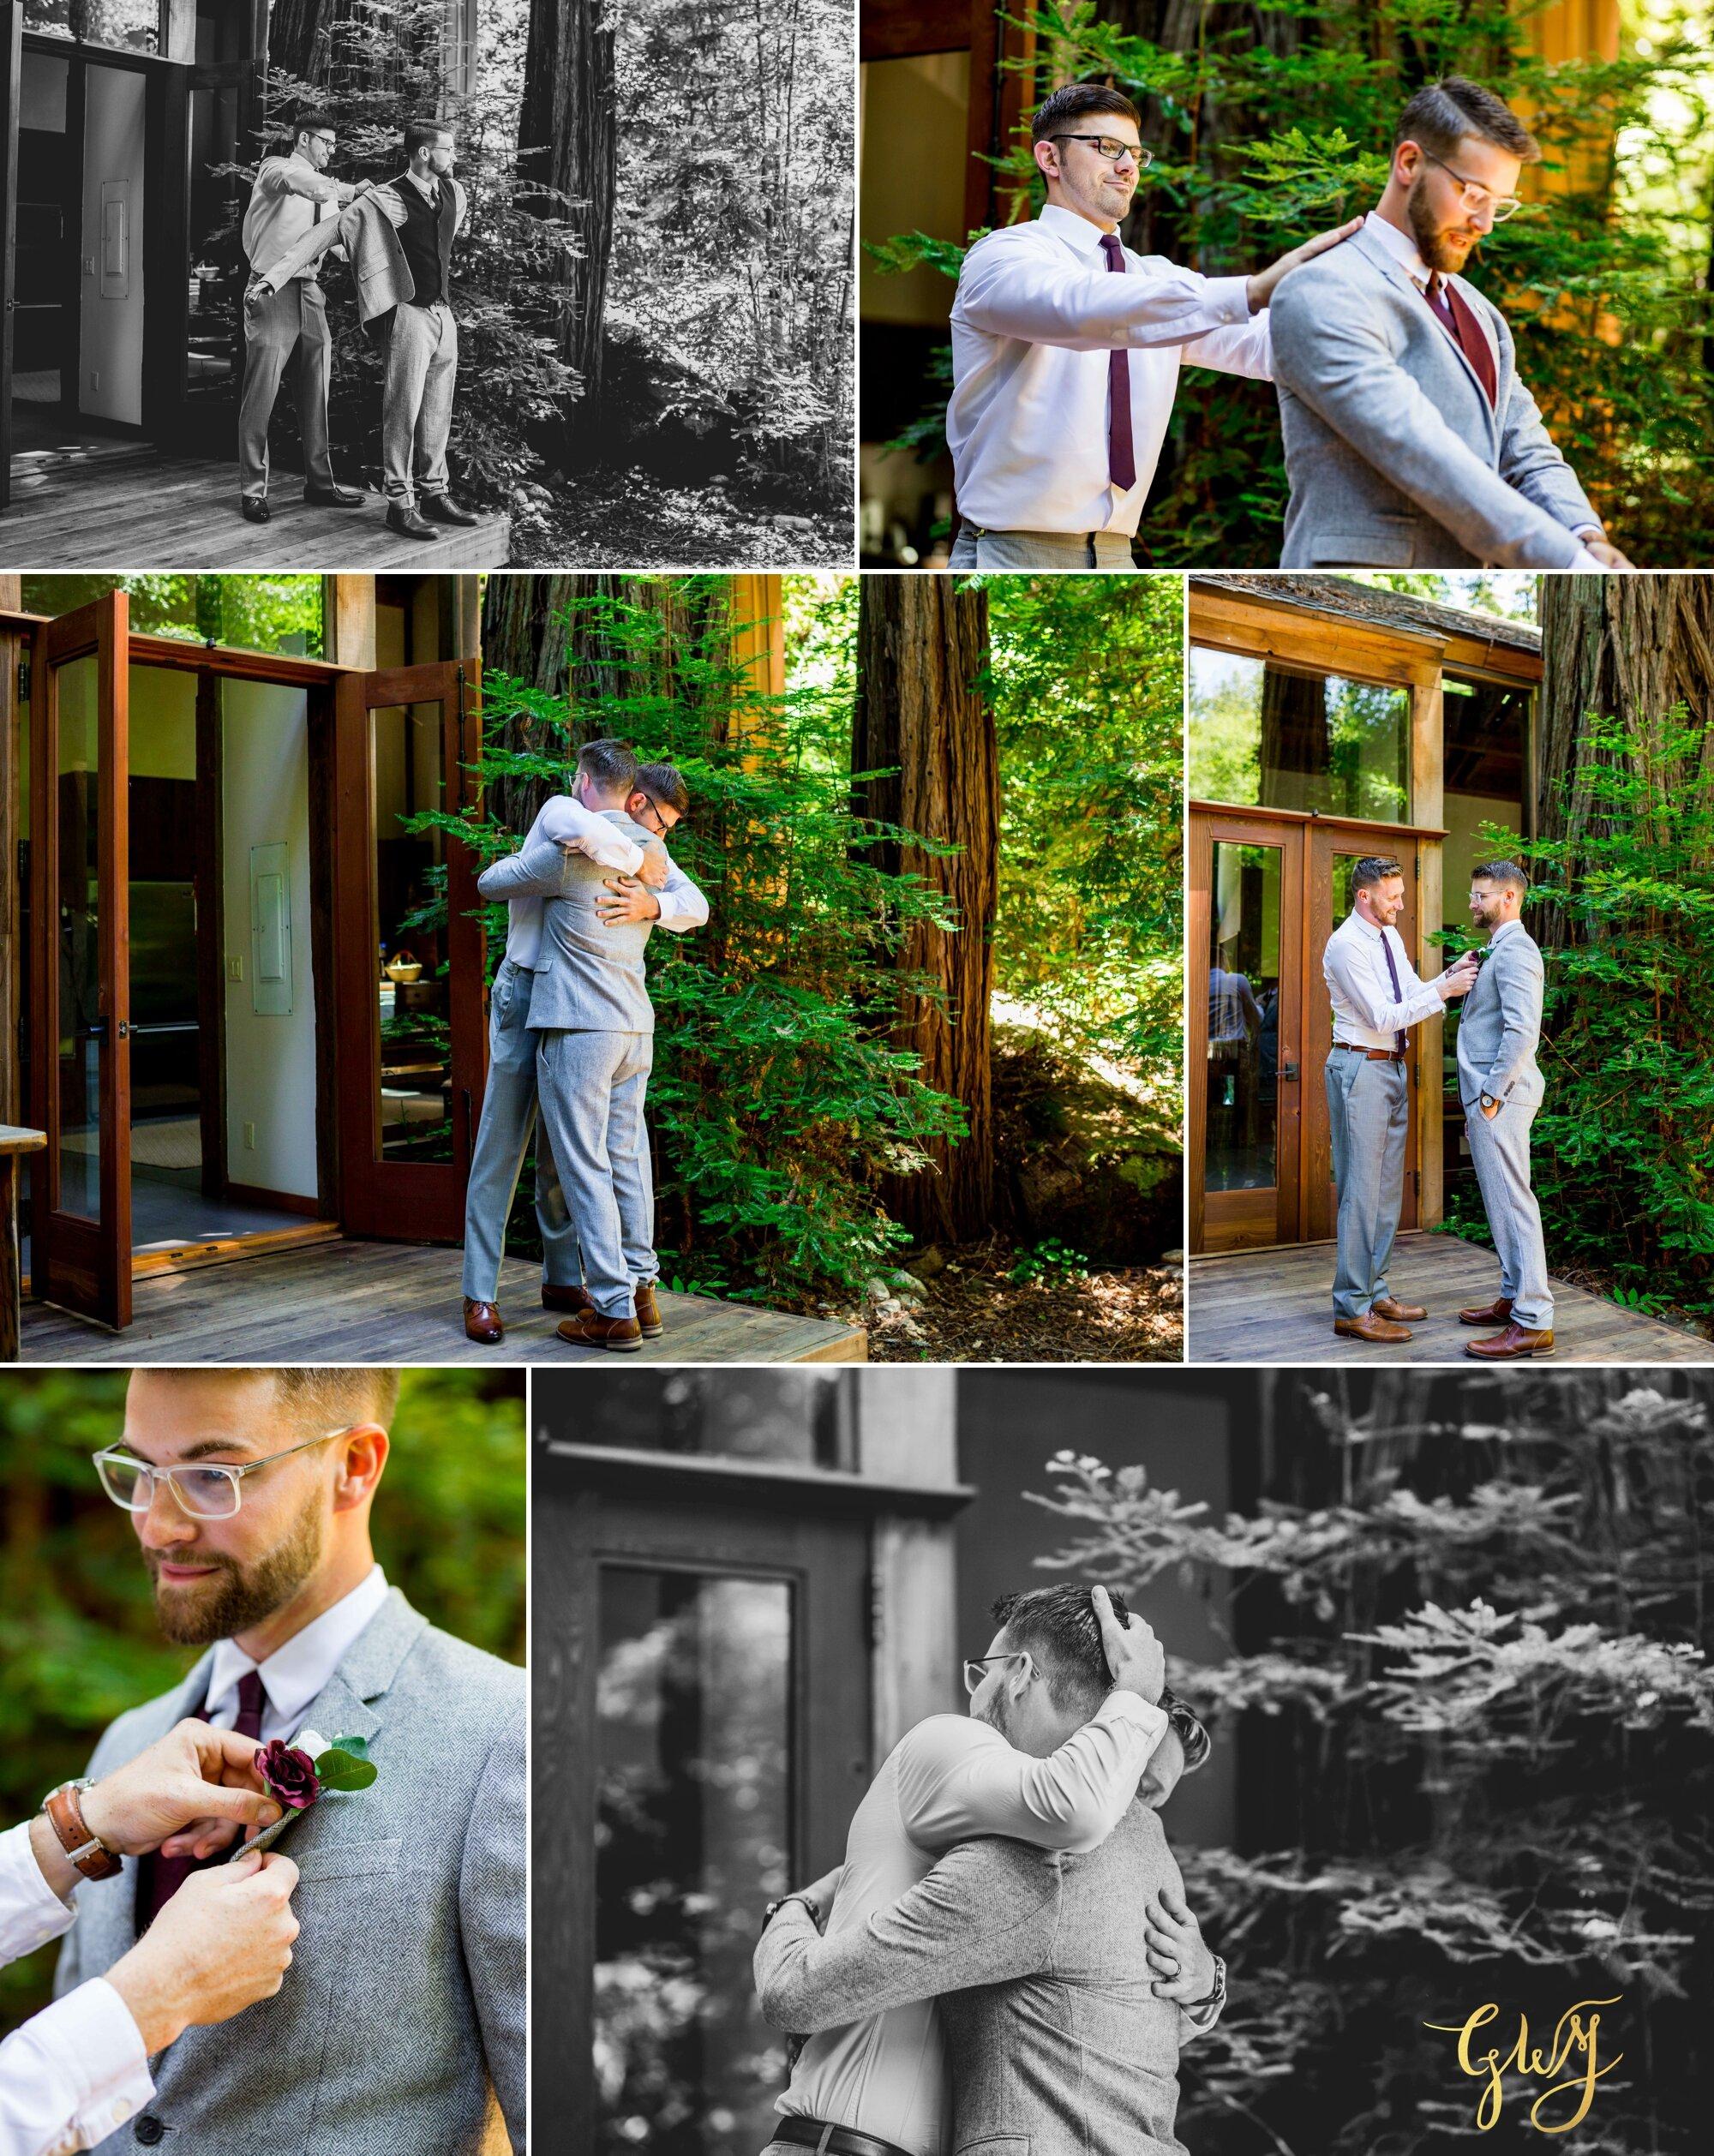 Casey + Jordan's Intimate Big Sur Elopement in the Redwoods by Glass Woods Media 11.jpg